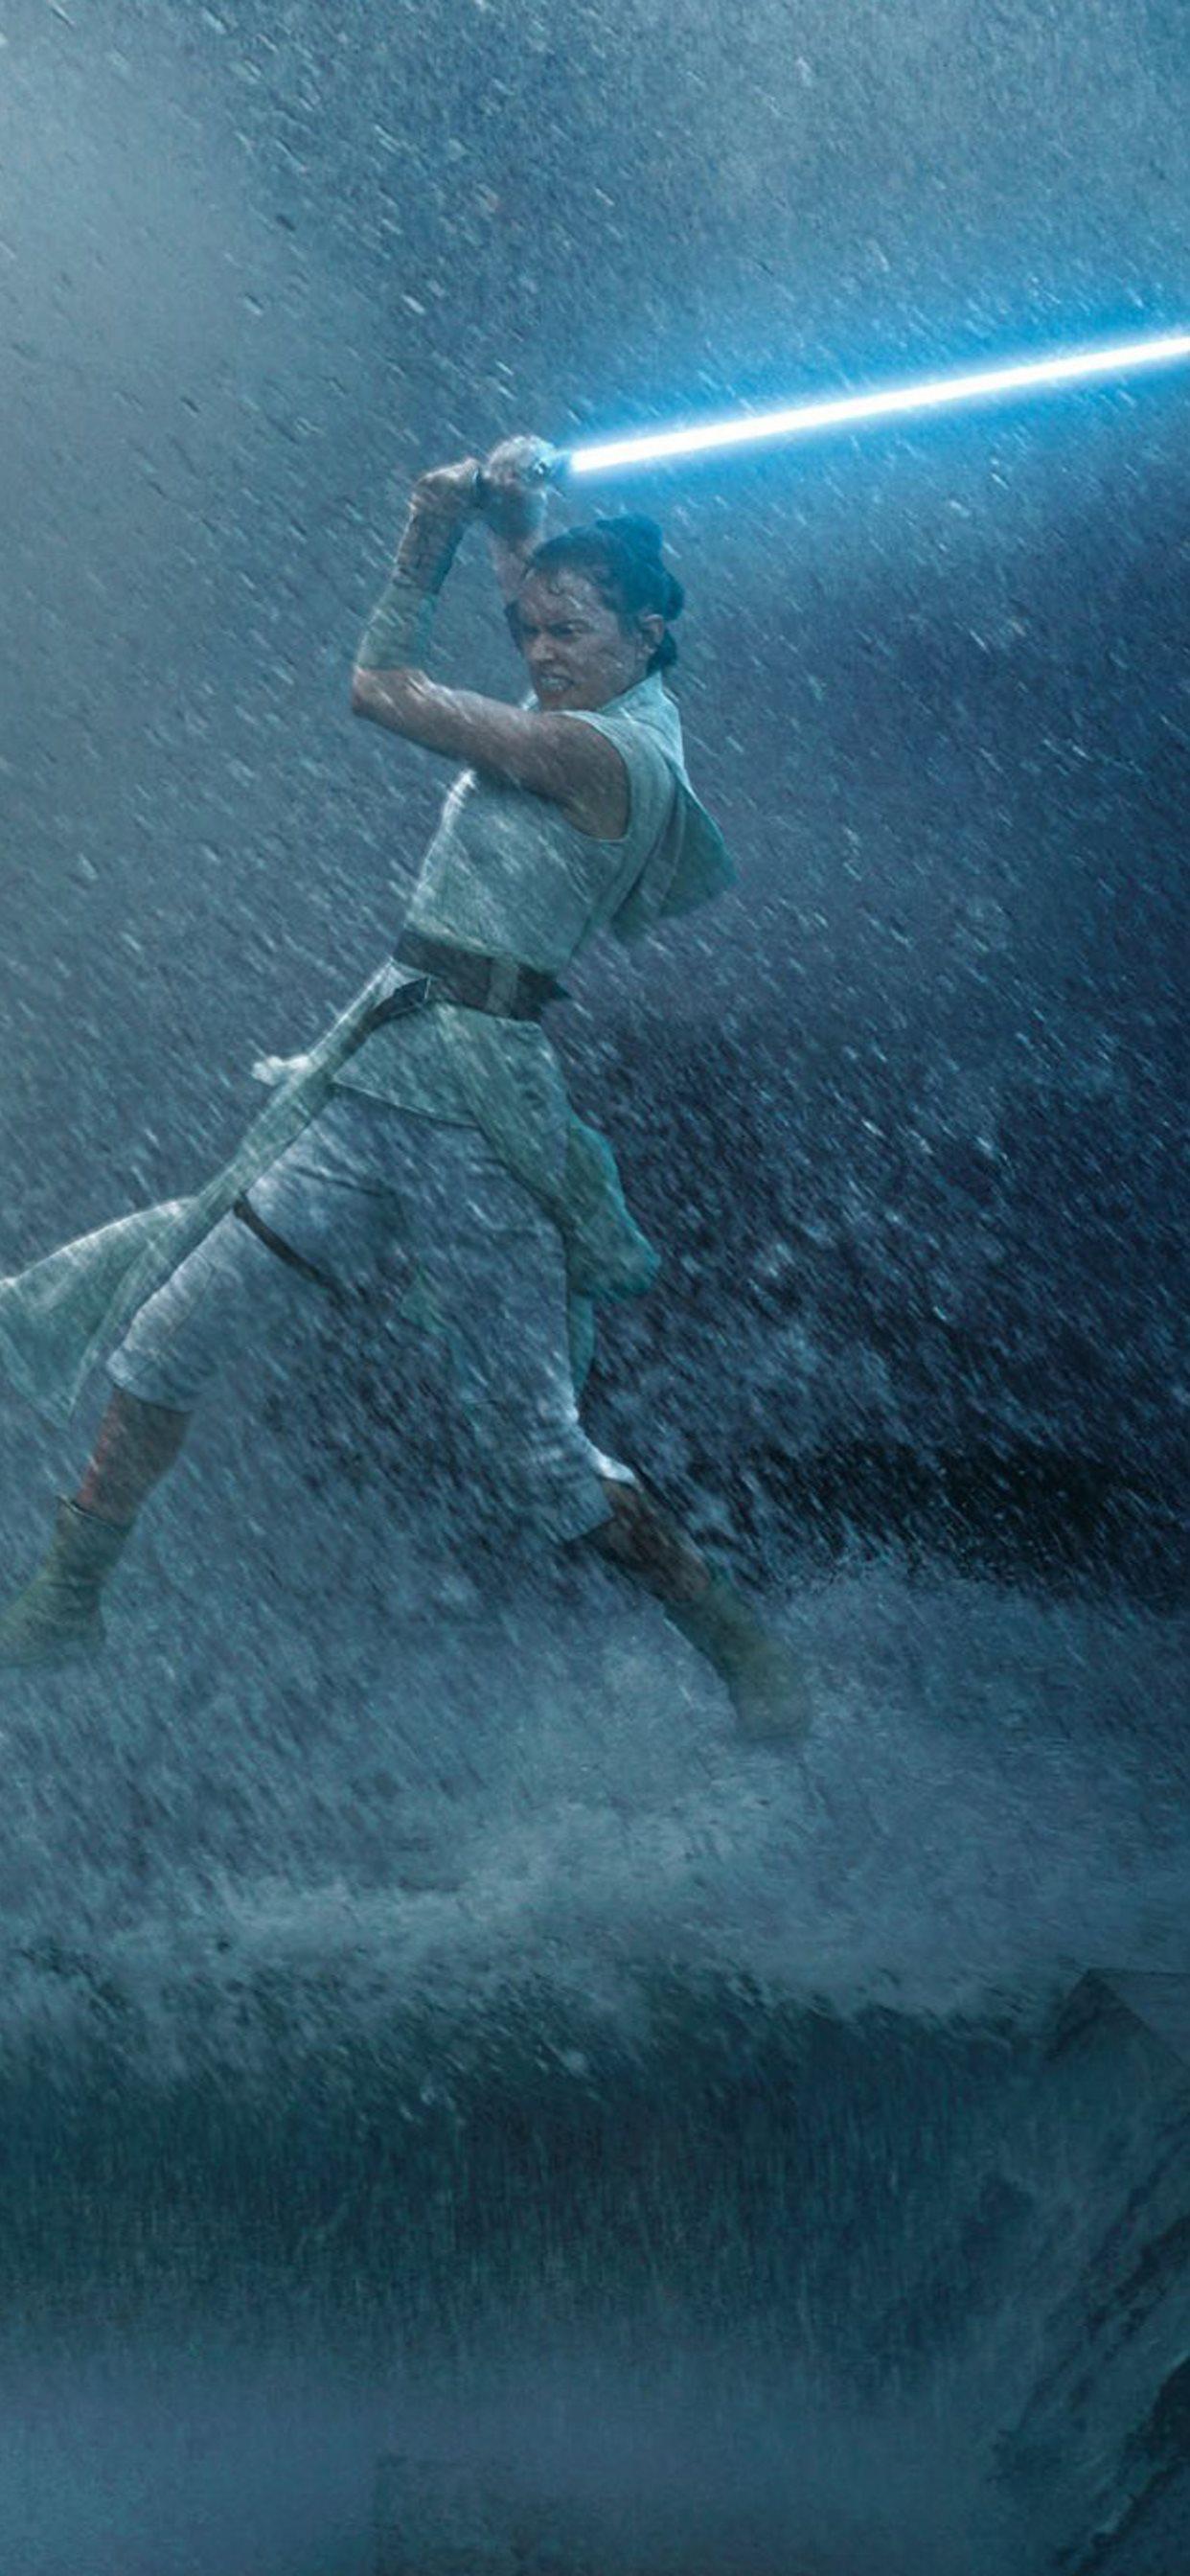 Rey Vs Kylo Ren Star Wars The Rise Of Skywalker Iphone Wallpapers